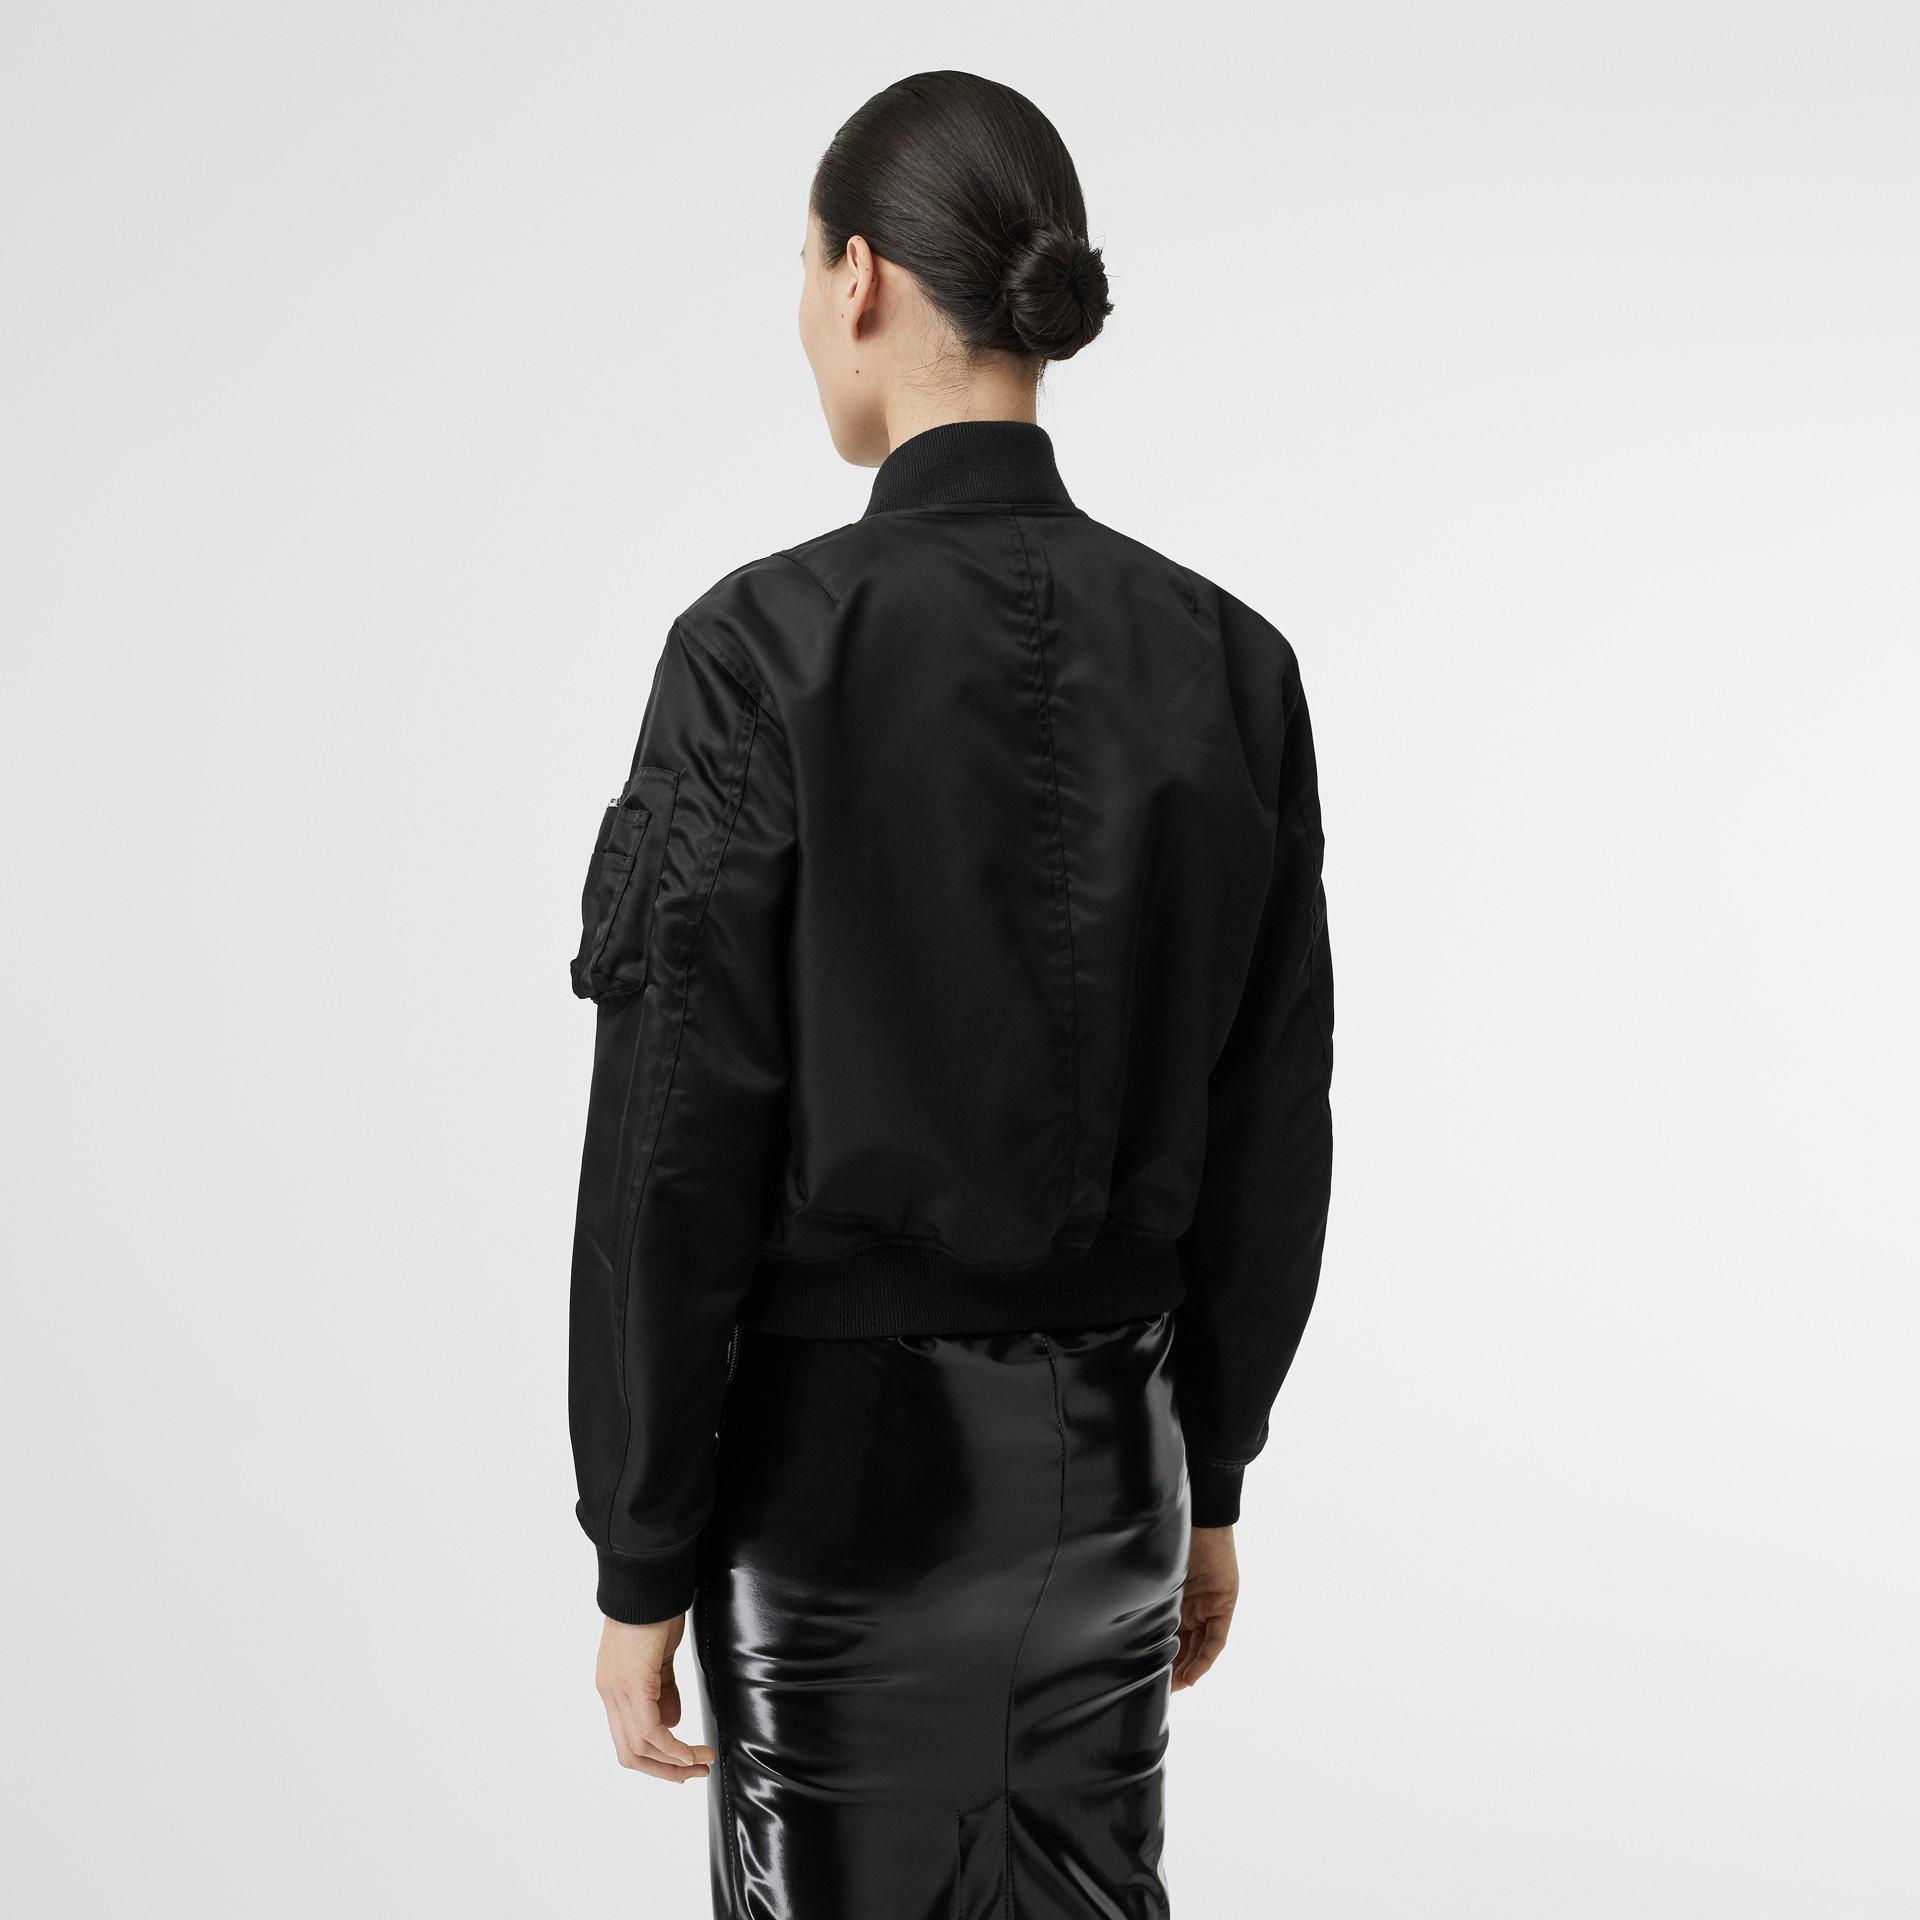 Union Jack Motif Nylon Bomber Jacket in Black - Women | Burberry Australia - gallery image 2